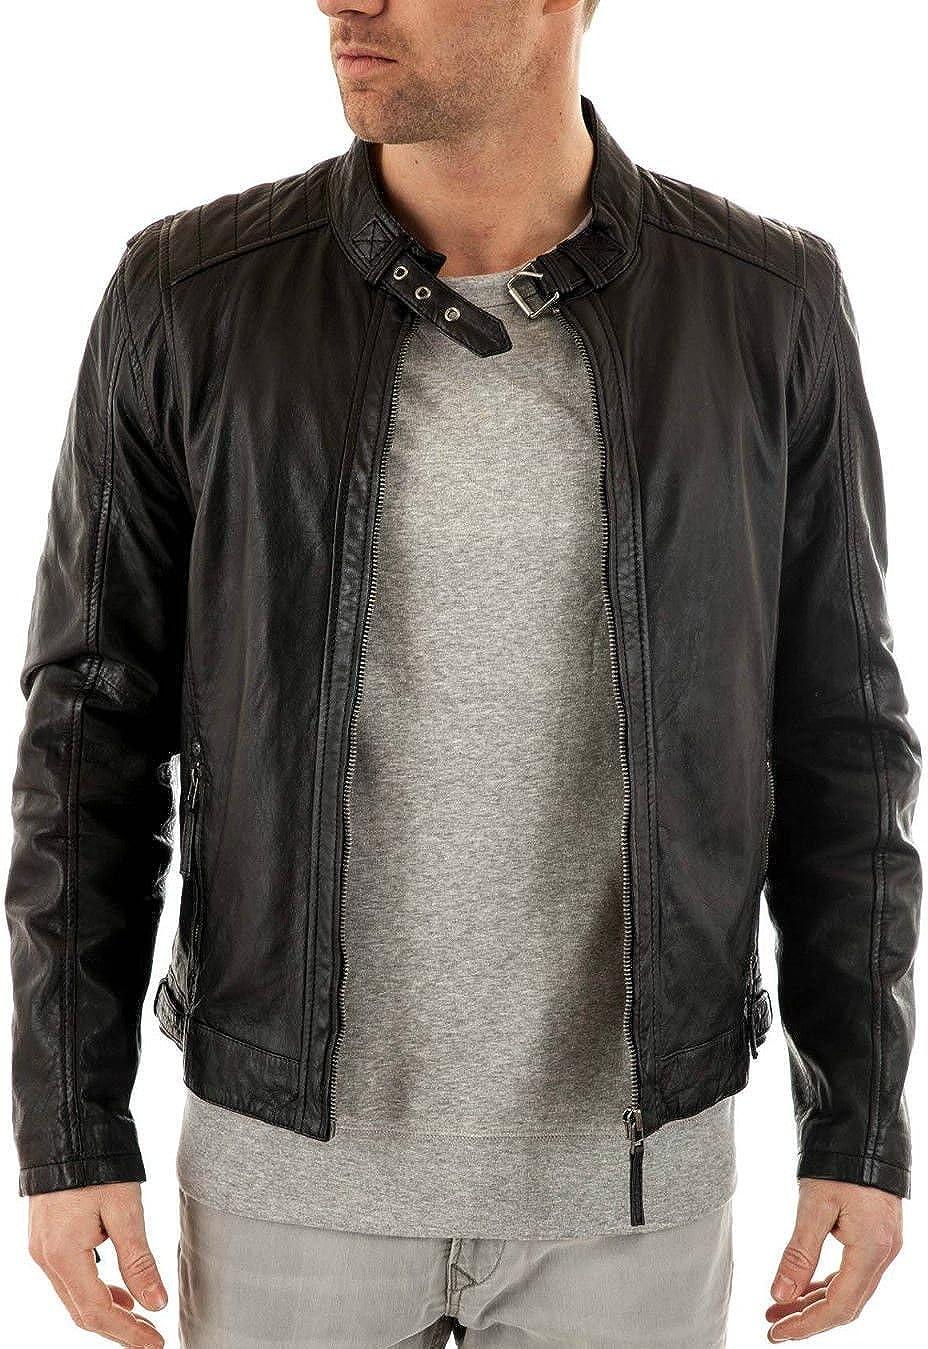 World Of Leather Mens Genuine Lambskin//Sheepskin Biker Leather Jacket Moto